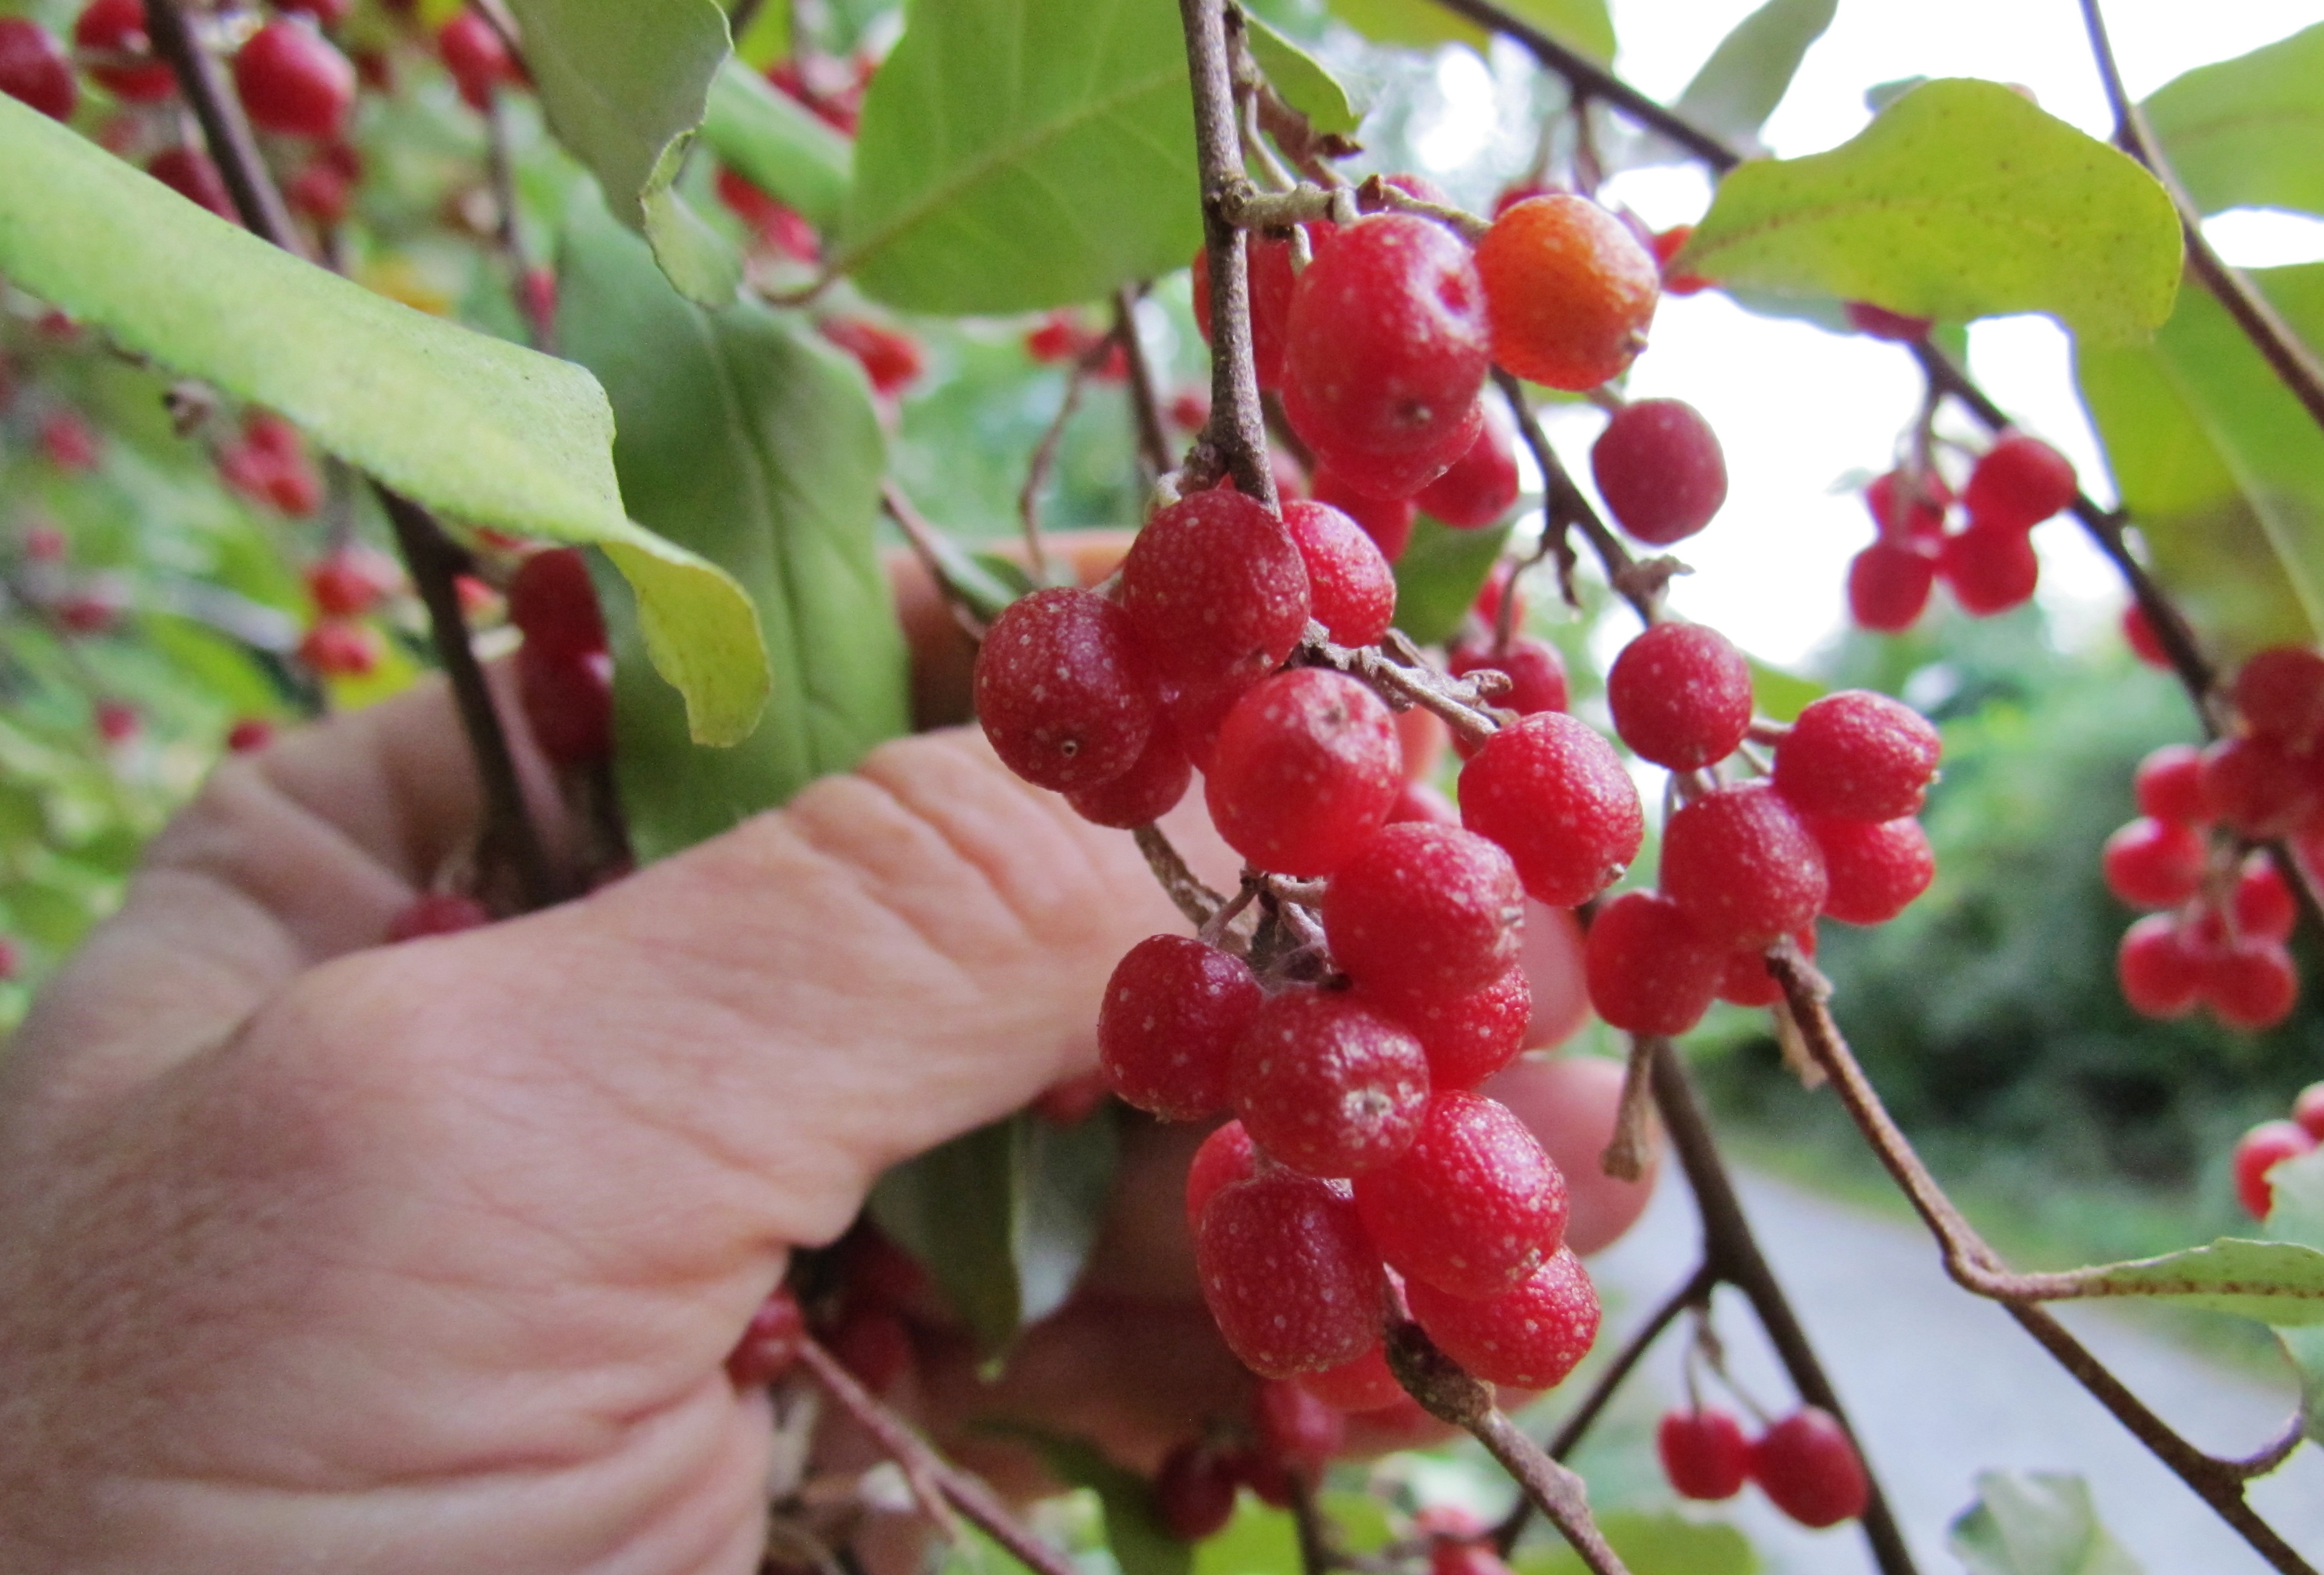 Autumn olives ripe on the vine.